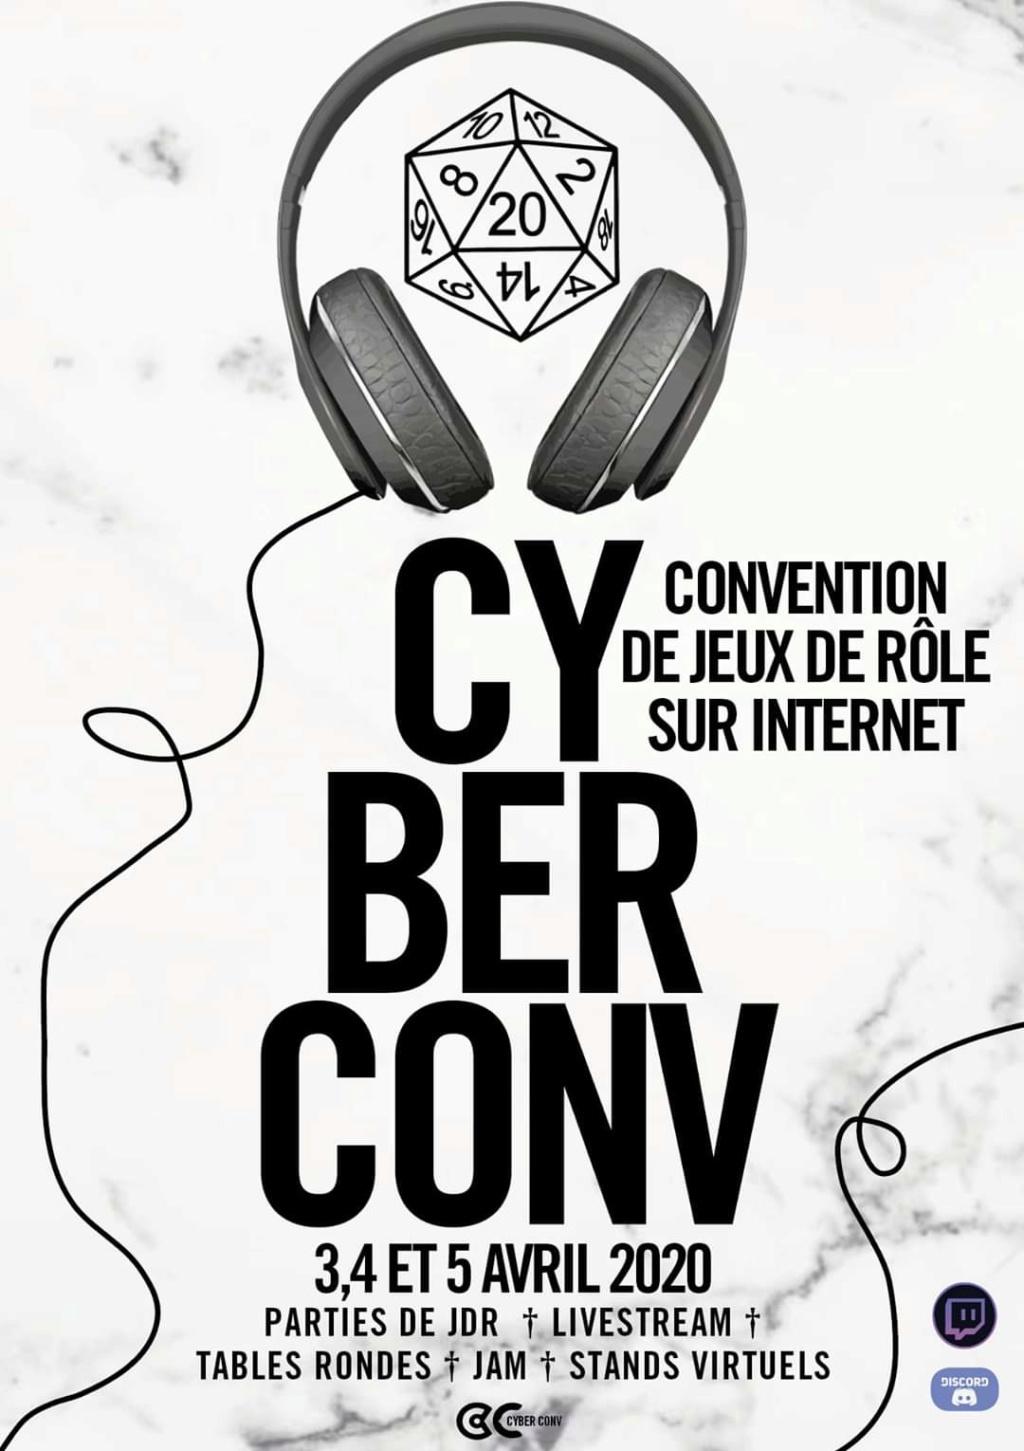 Cyber Conv - 3, 4 et 5 avril 2020 Fb_img10